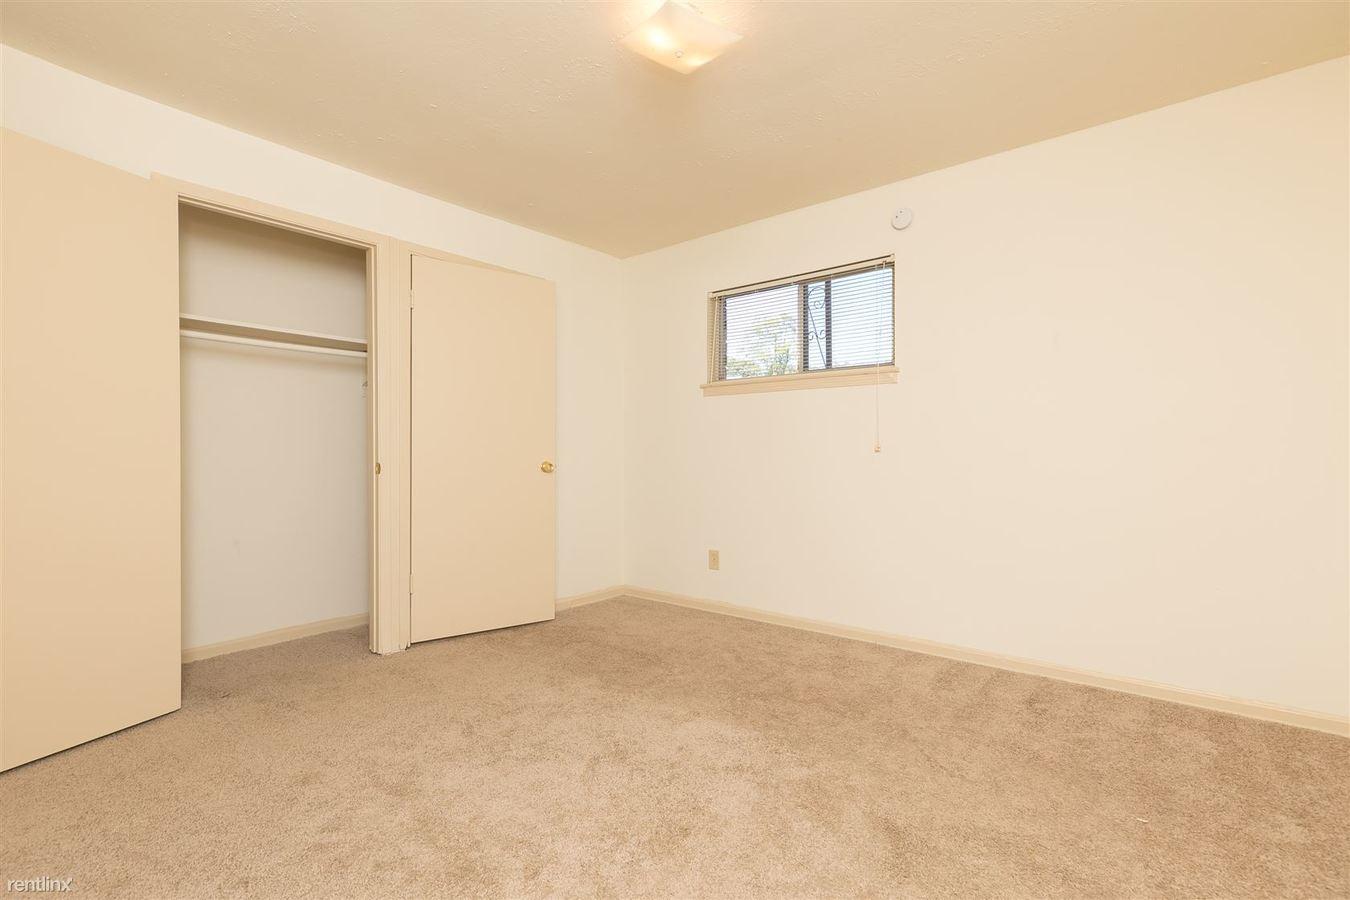 1 Bedroom 1 Bathroom Apartment for rent at Knox Landing Apartments in Marietta, GA